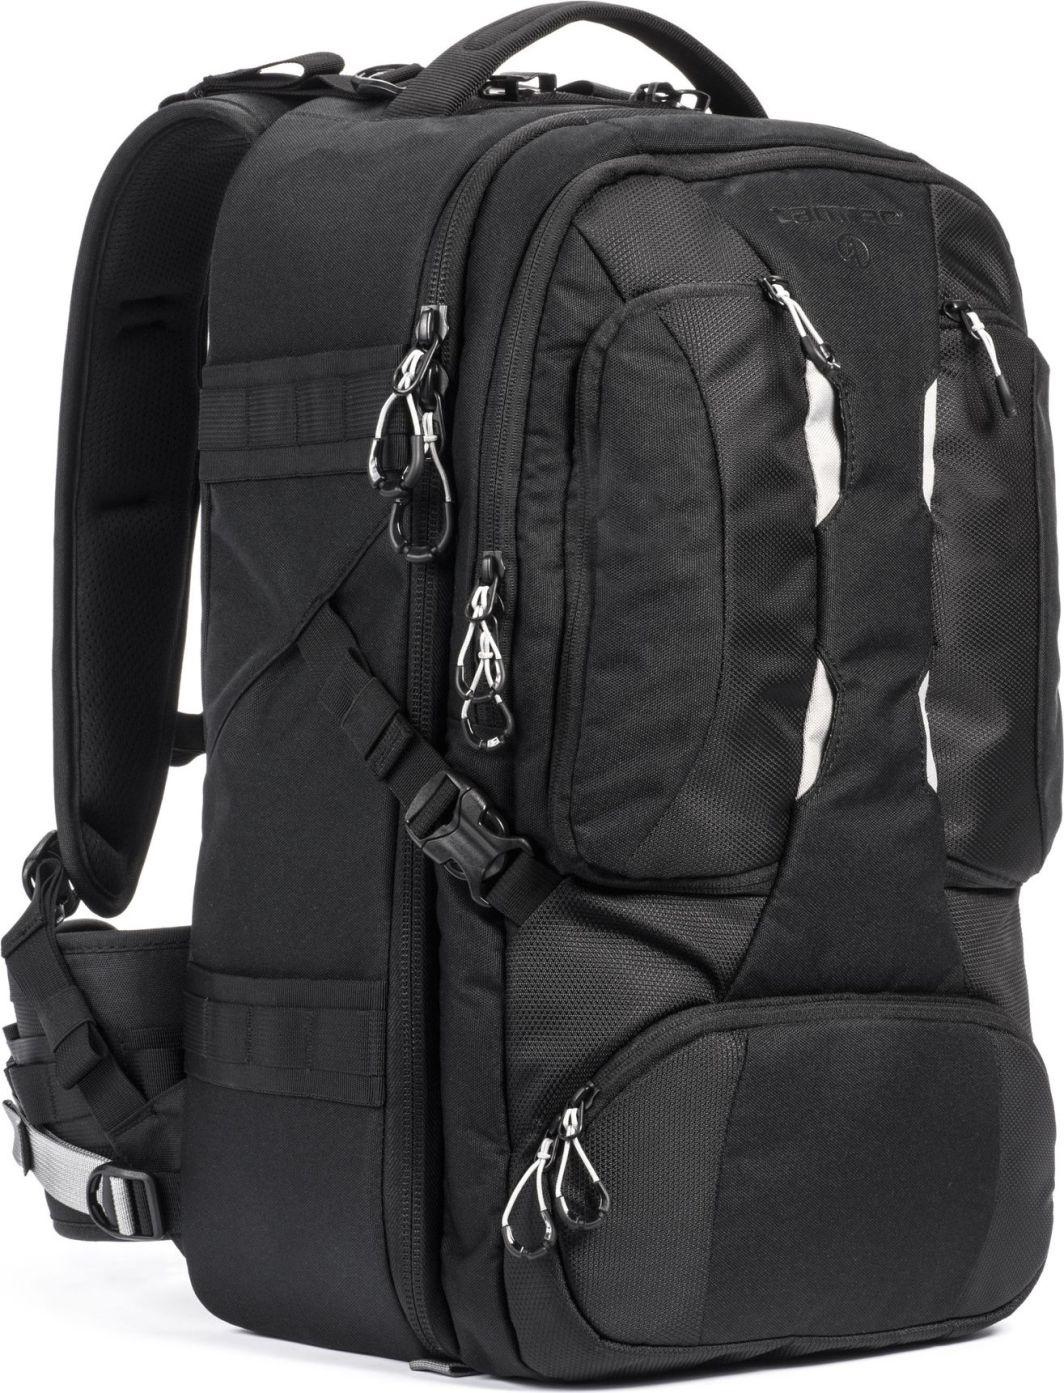 Plecak Tamrac Anvil 27 (TA-T0250) 1